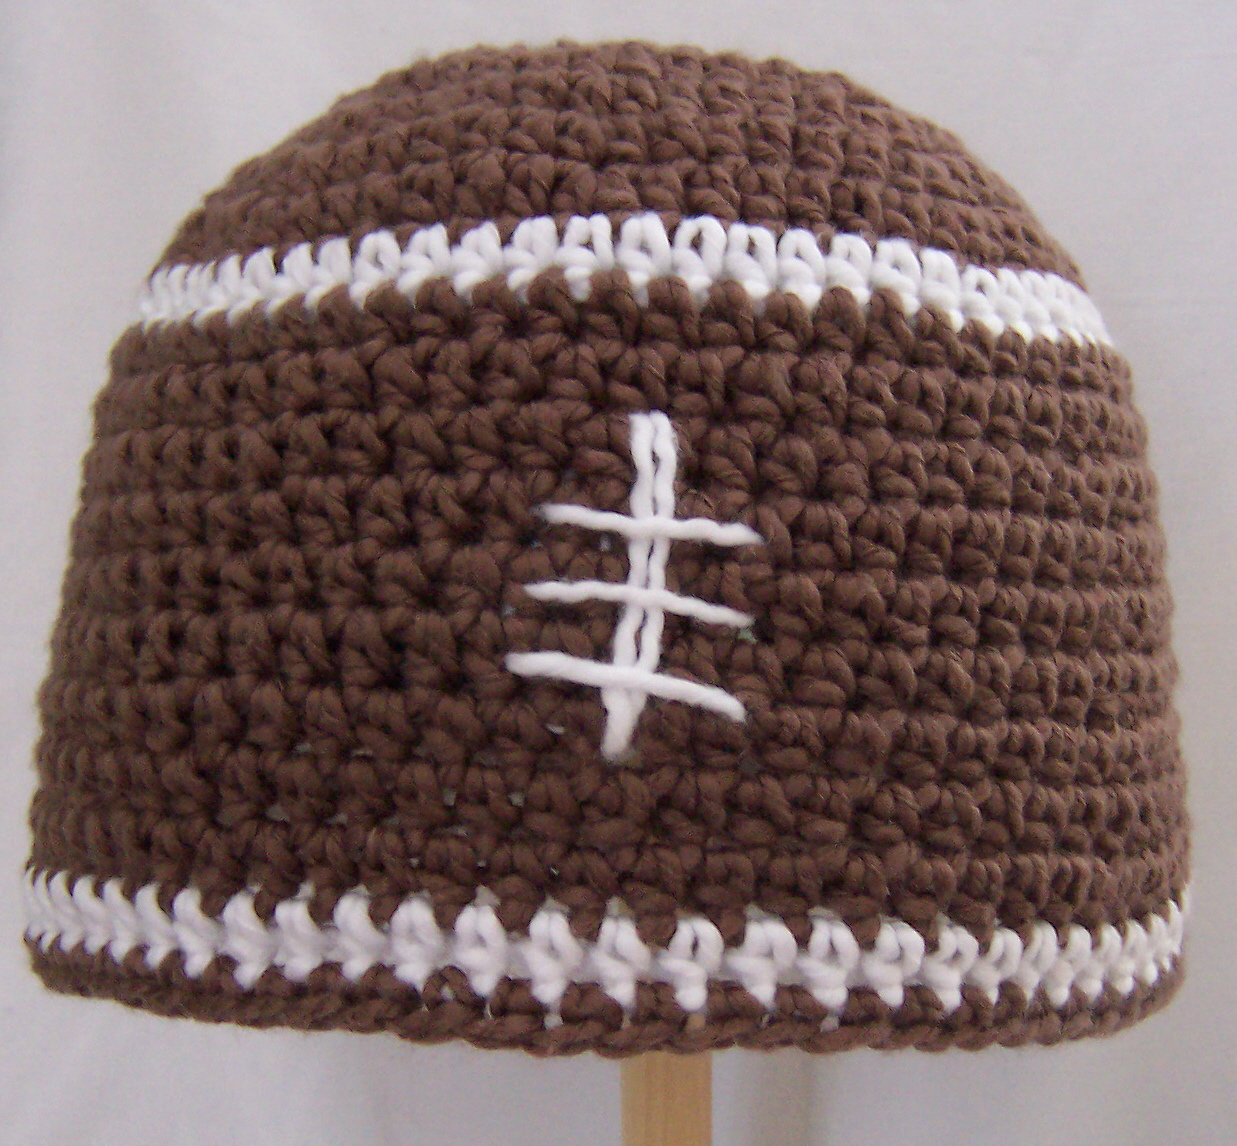 Free Crochet Patterns: Free Crochet Pattern - Football ...